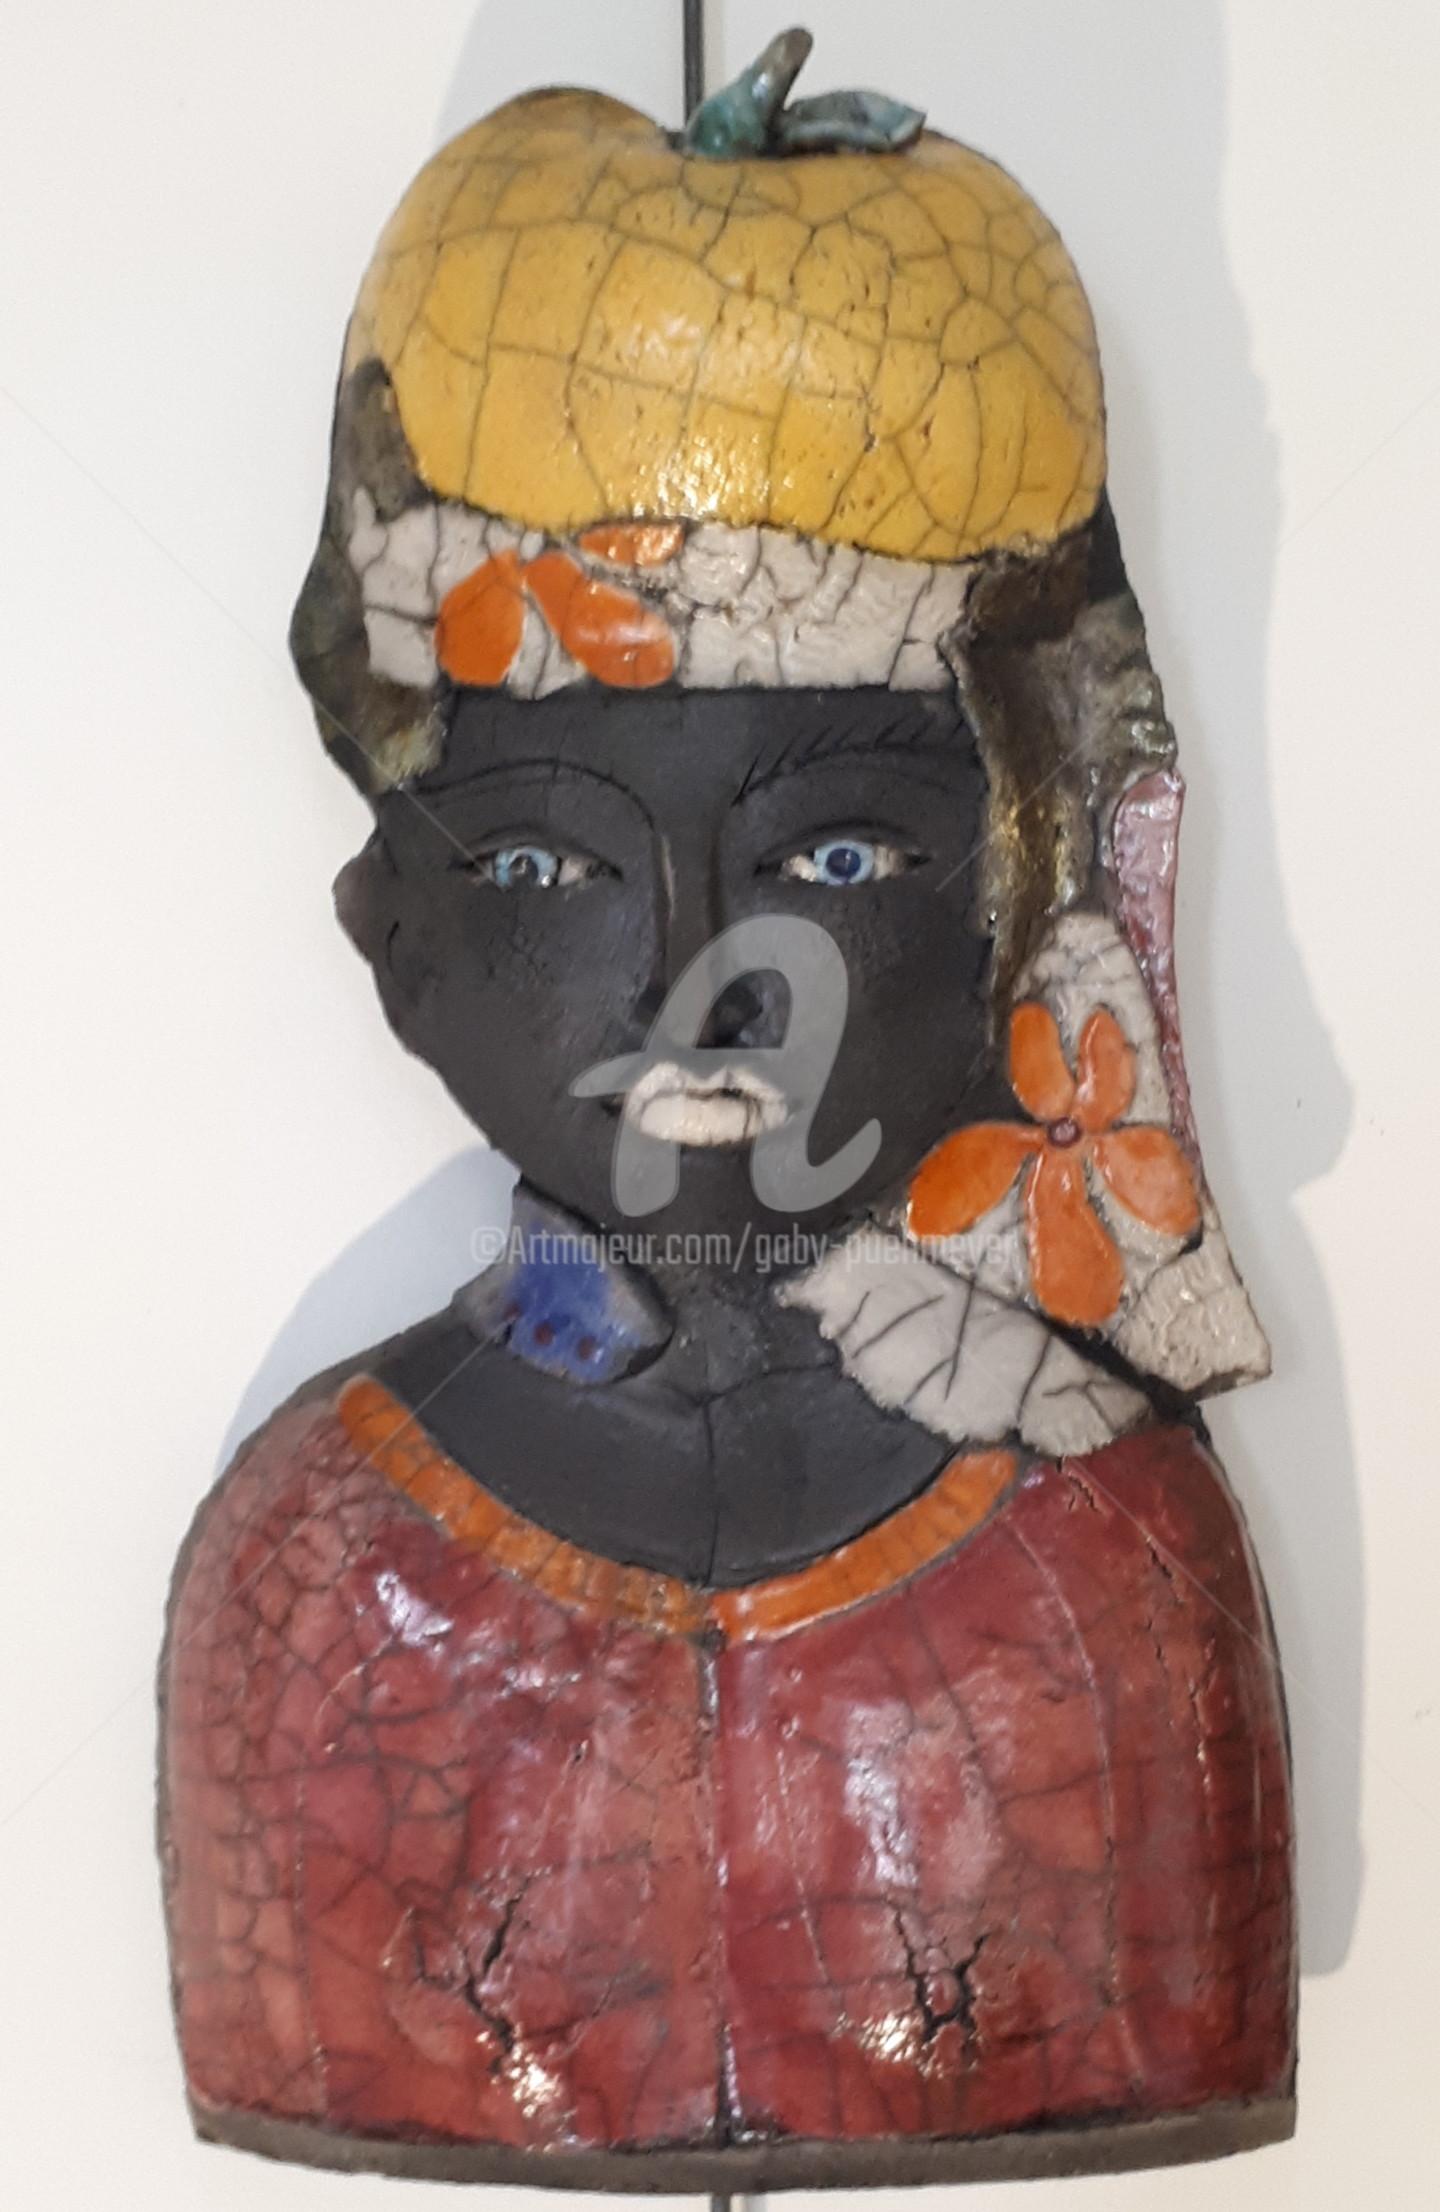 Gaby Pühmeyer - Travel Companion - Melon on Head